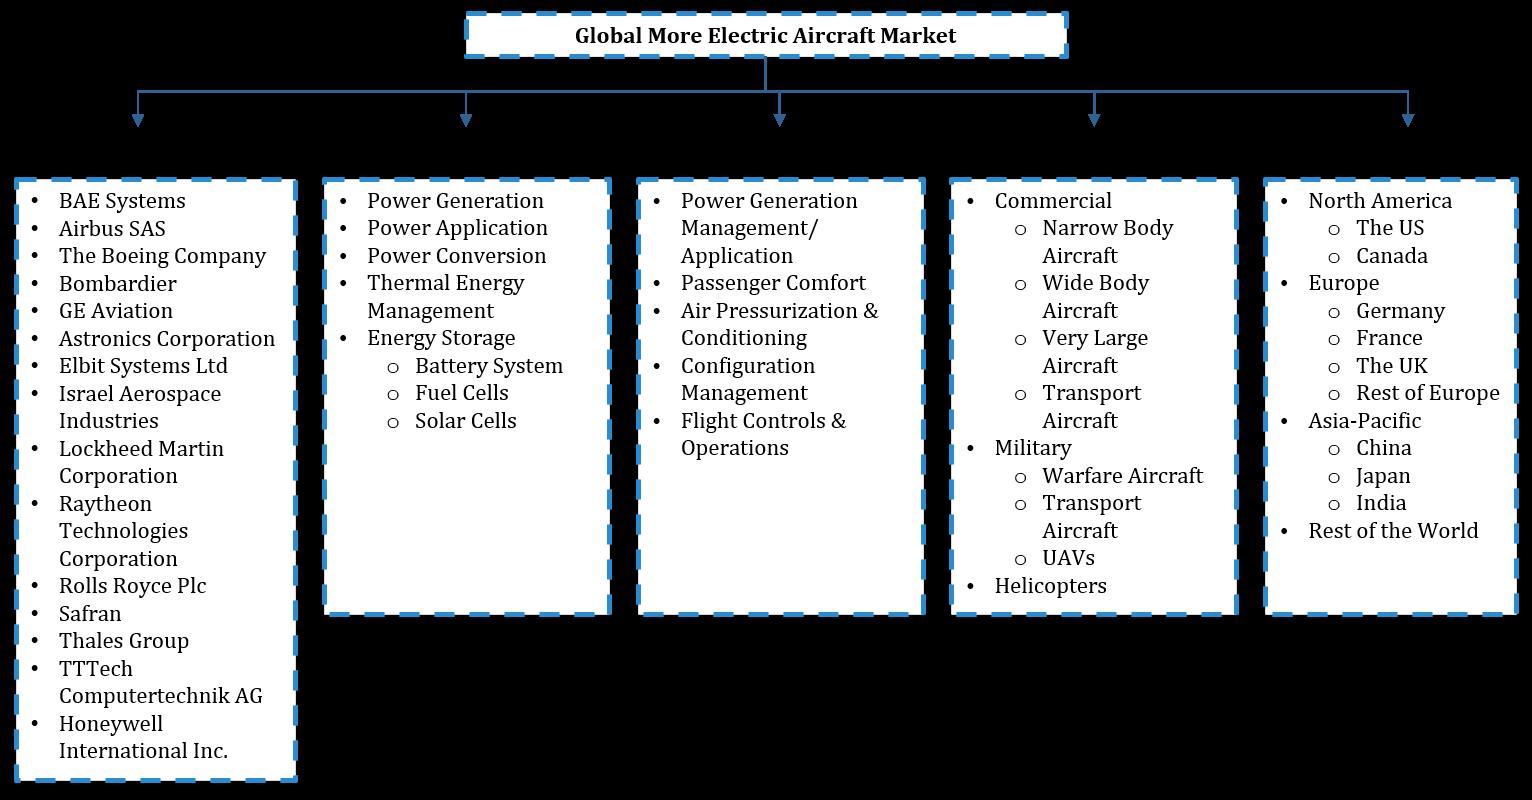 Global More Electric Aircraft Market segentation